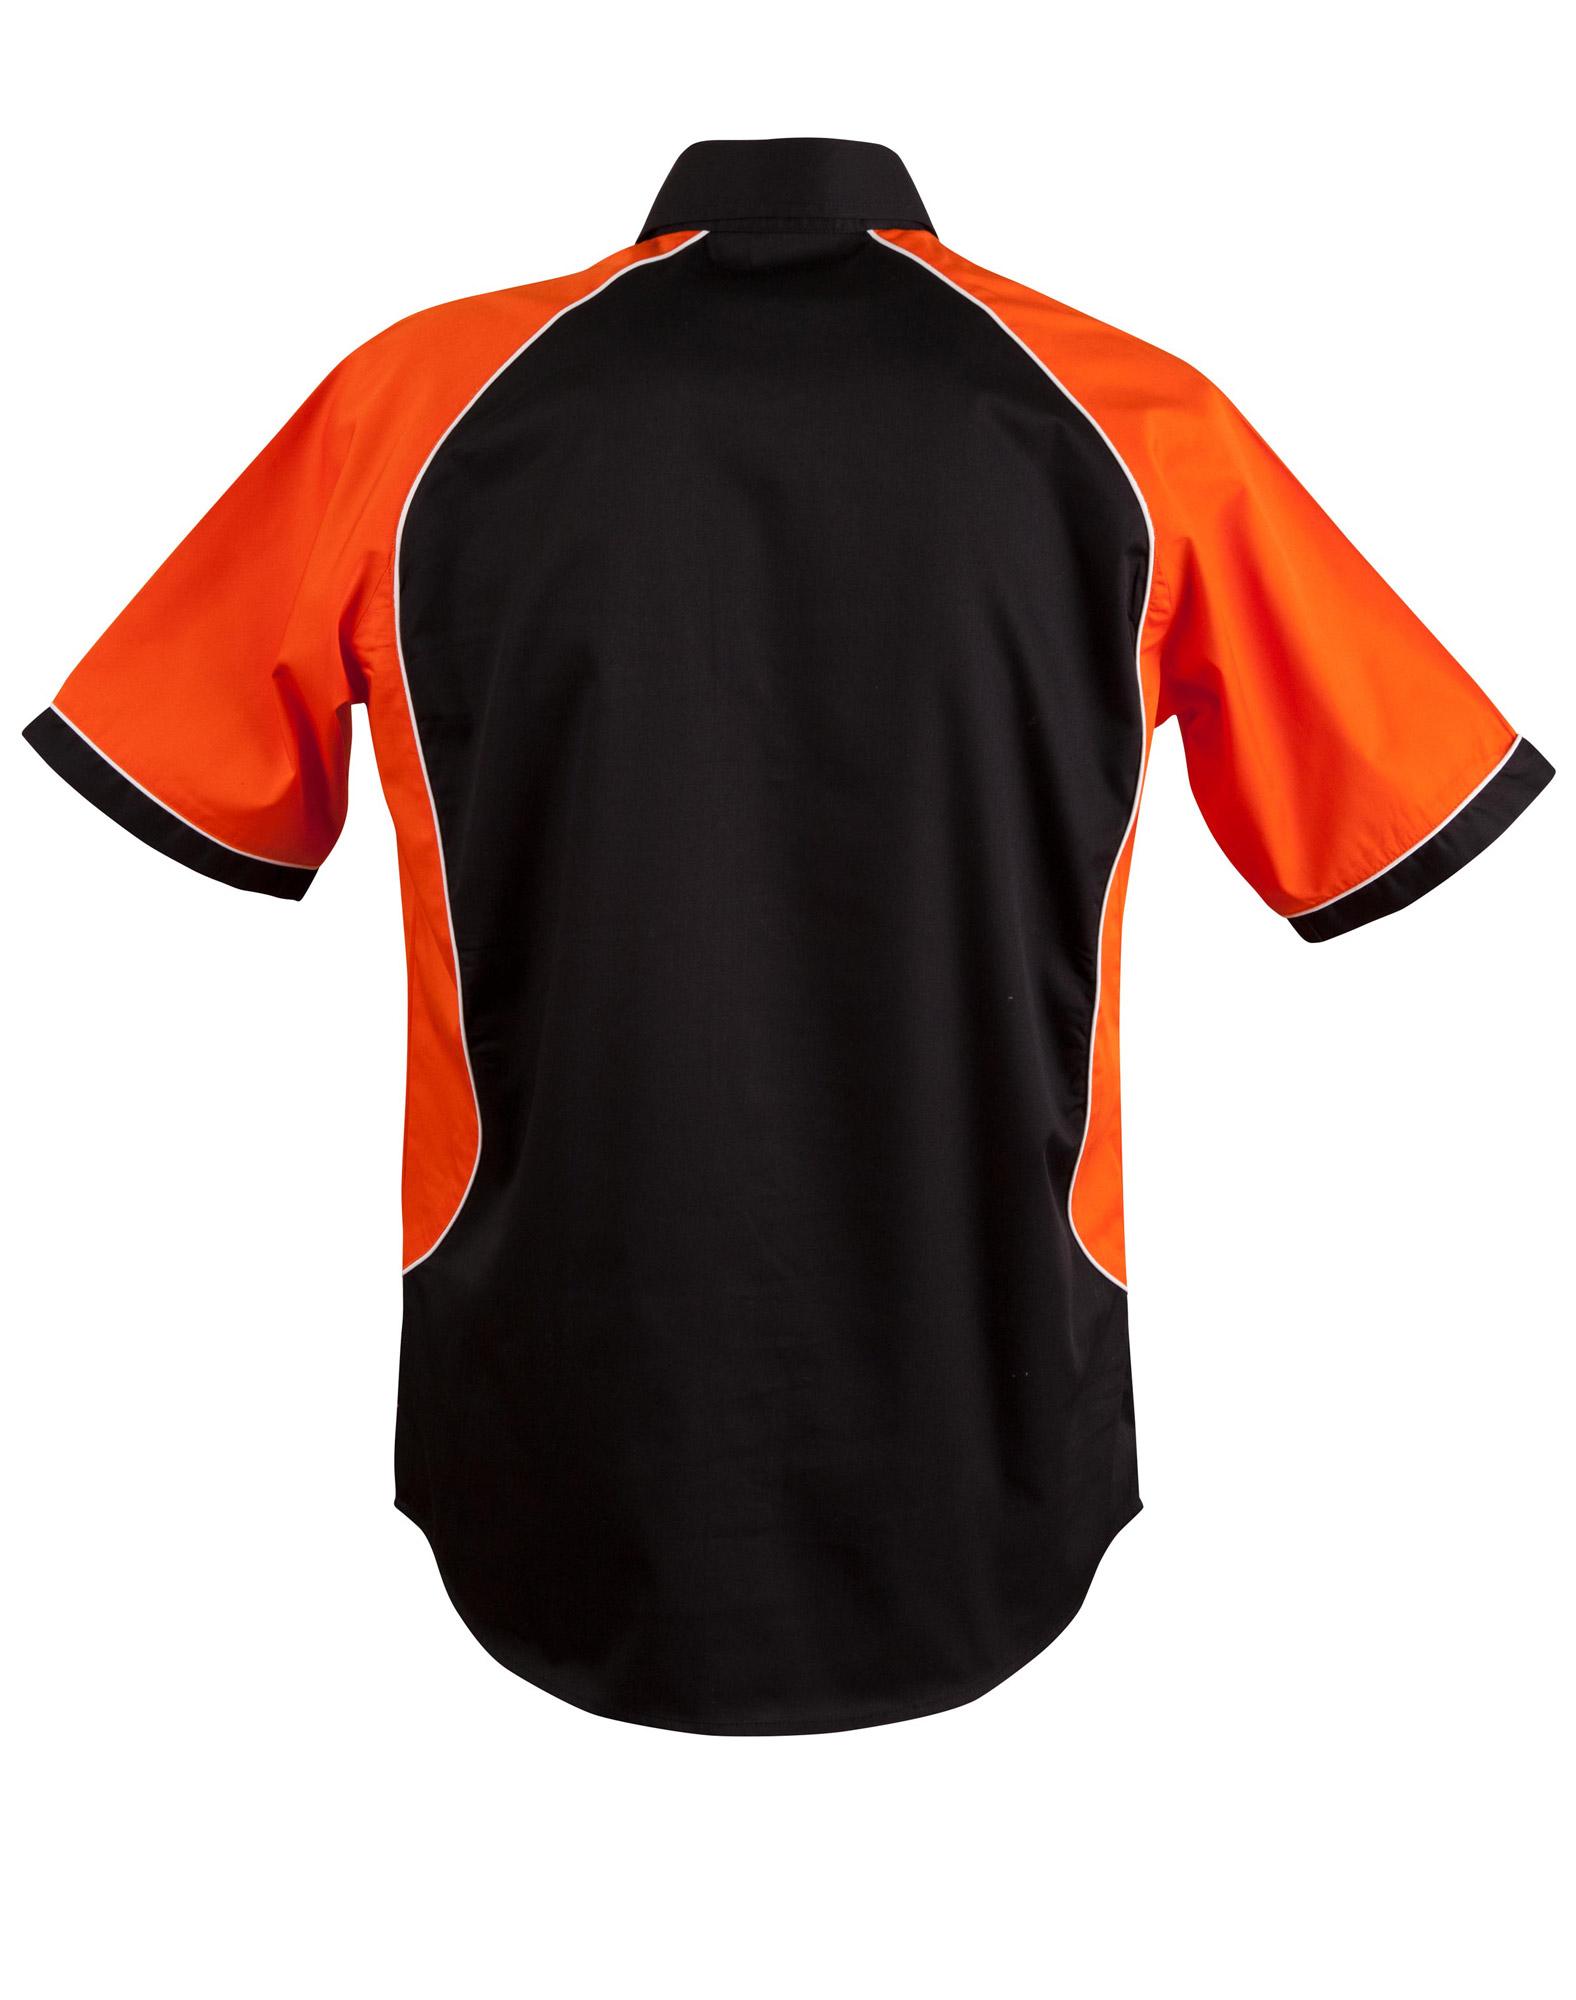 http://ws-imgs.s3.amazonaws.com/BUSINESSSHIRTS/BS15_Black.White.Orange_Back_l.jpg